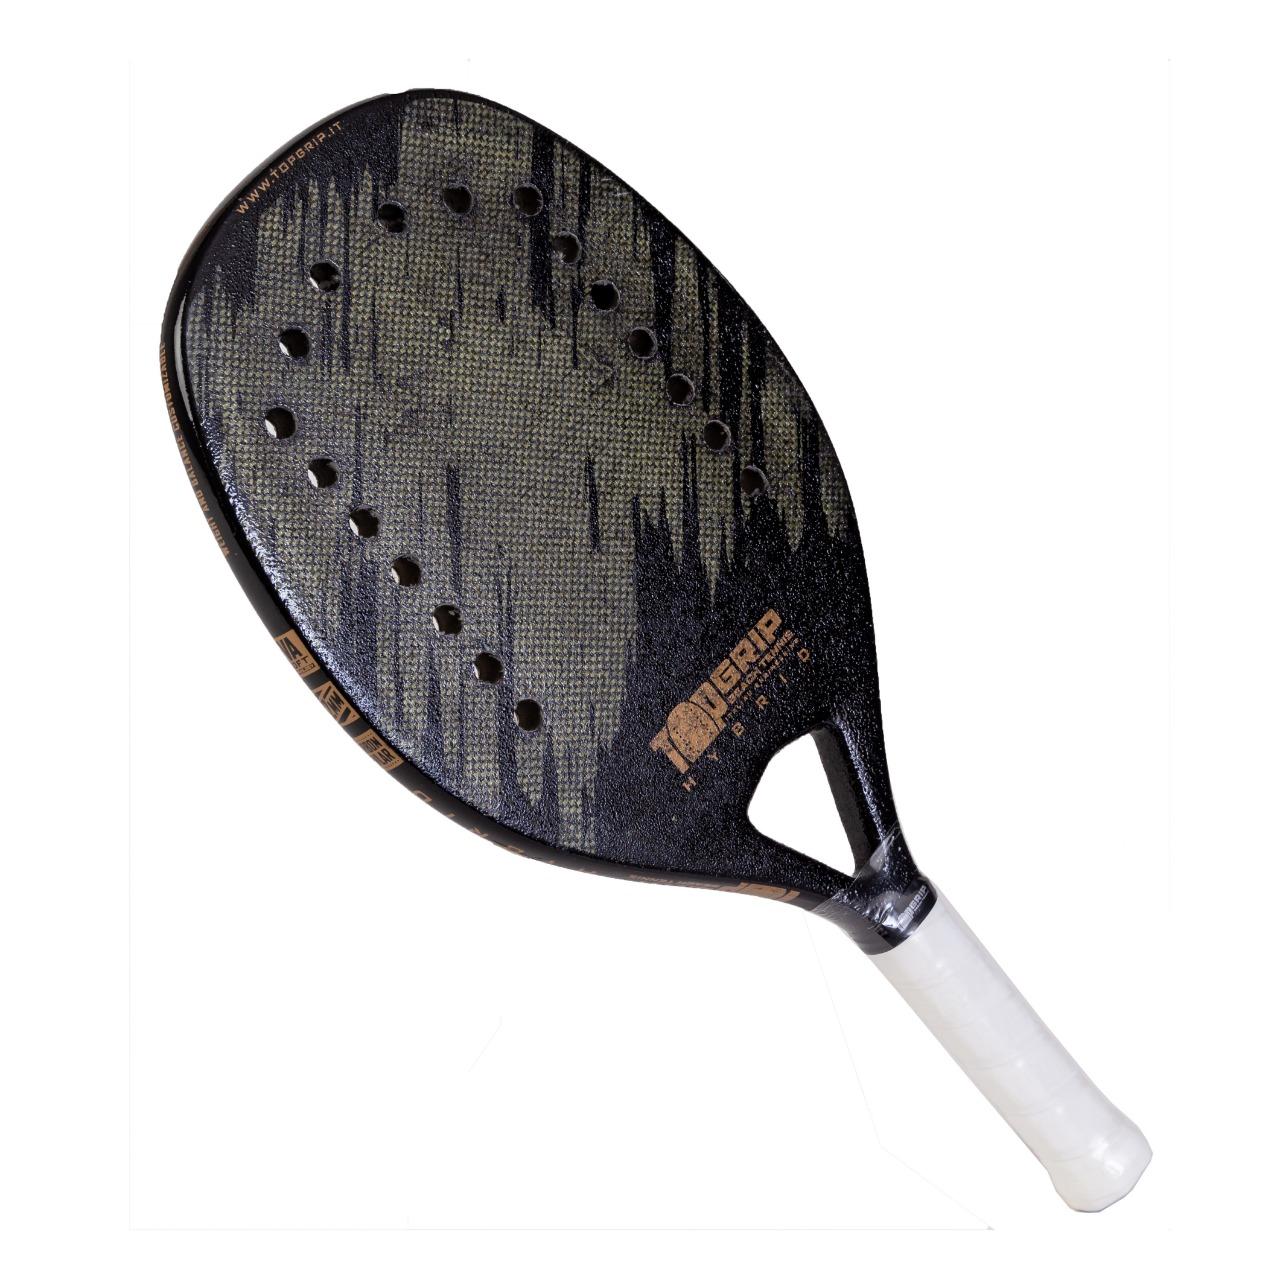 Raquete de Beach Tennis Top Grip Hybrid